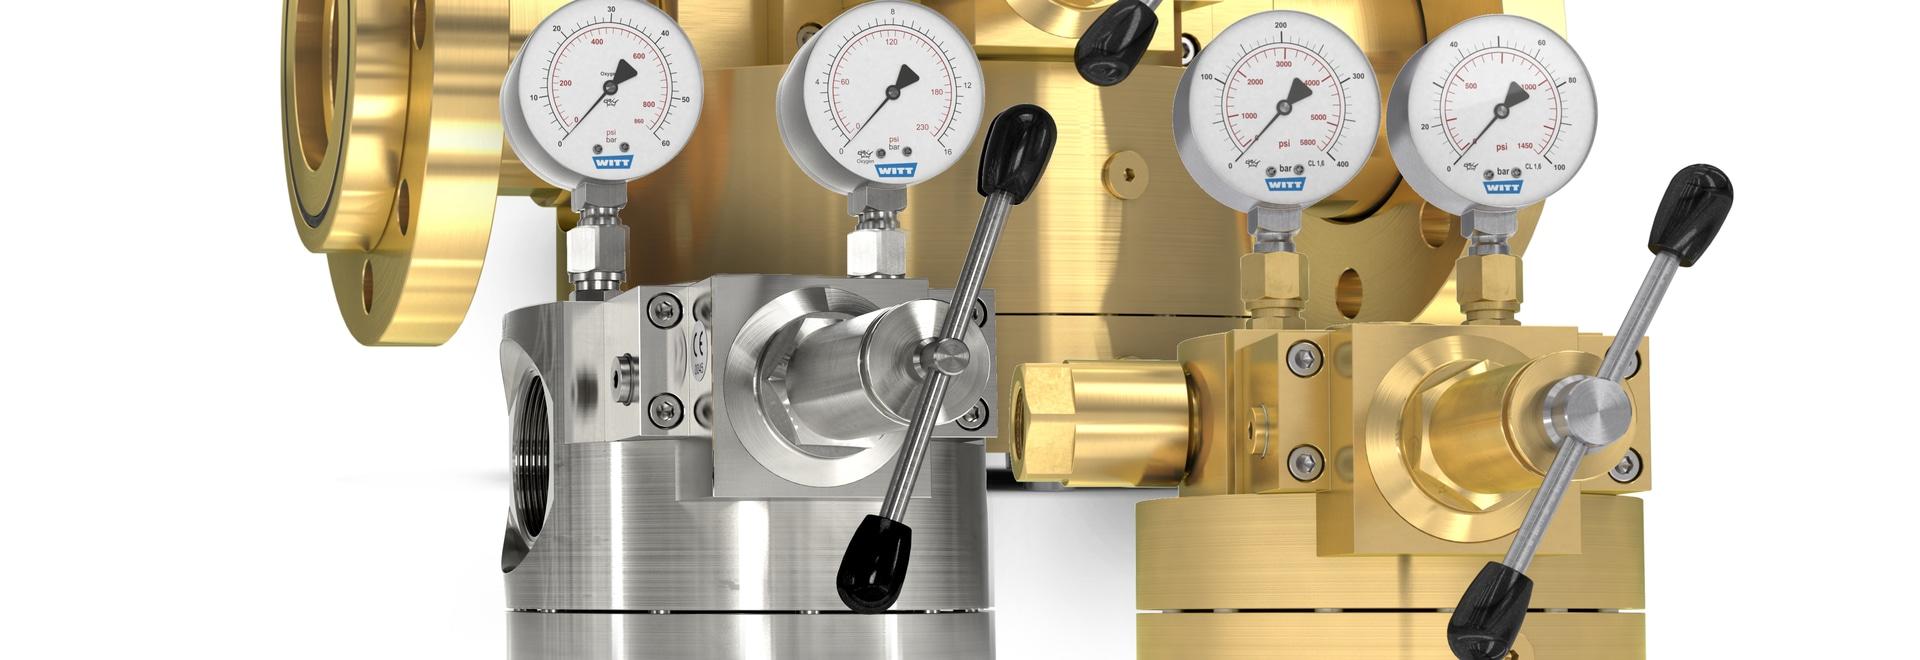 WITT dome-loaded pressure regulators